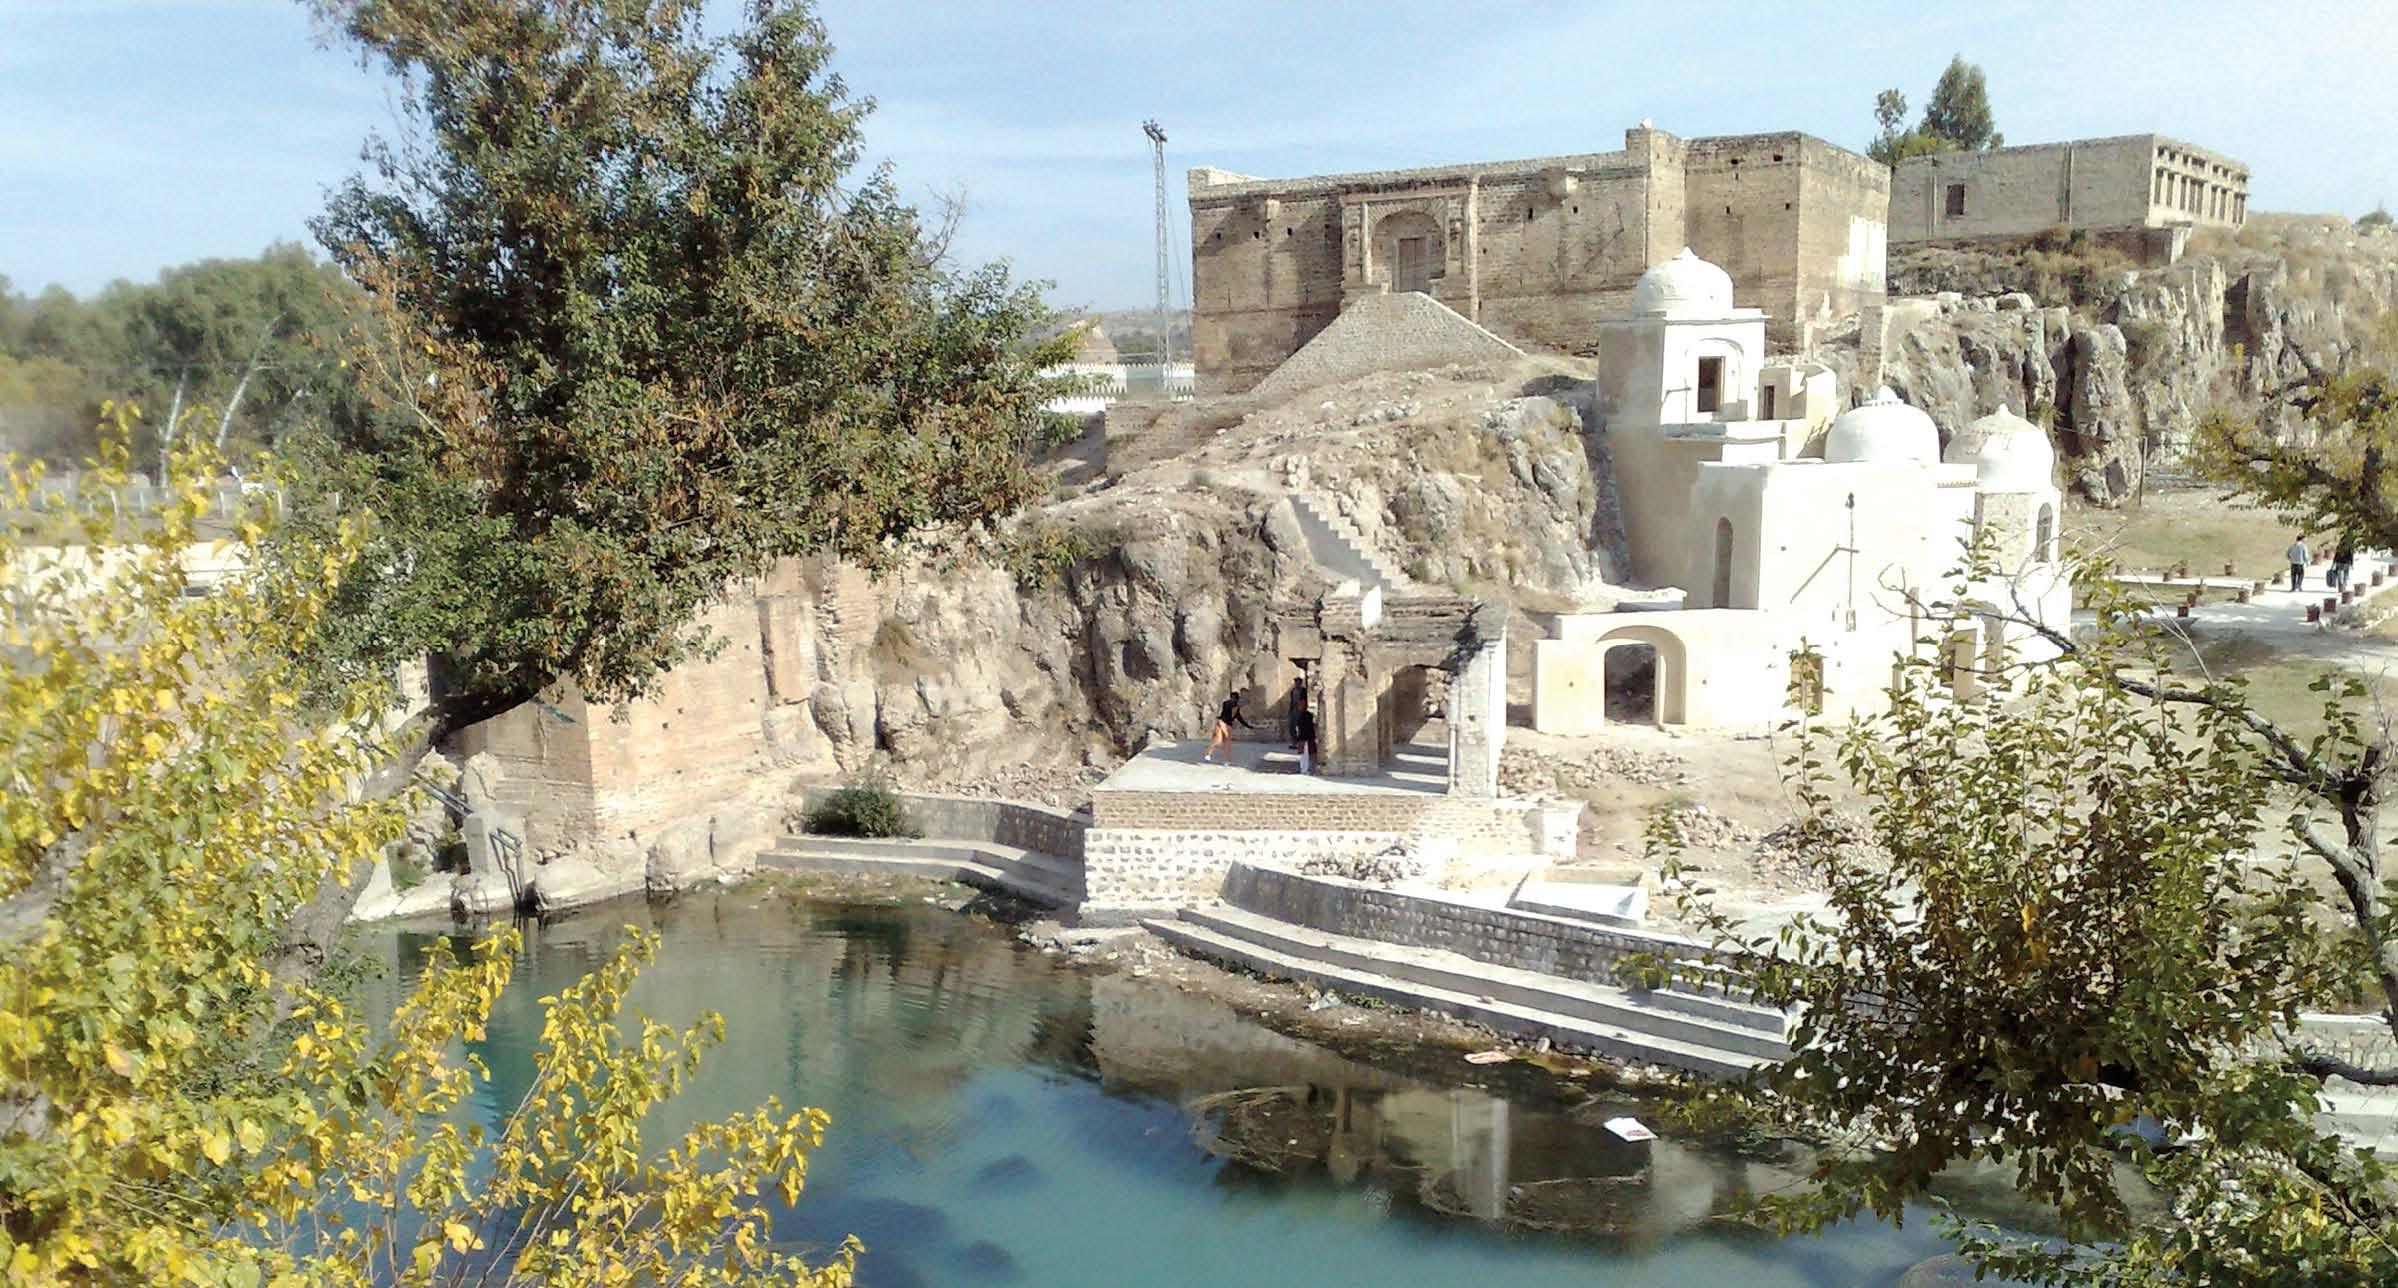 katas raj temple restoration cm orders ban on industrial units around historic site